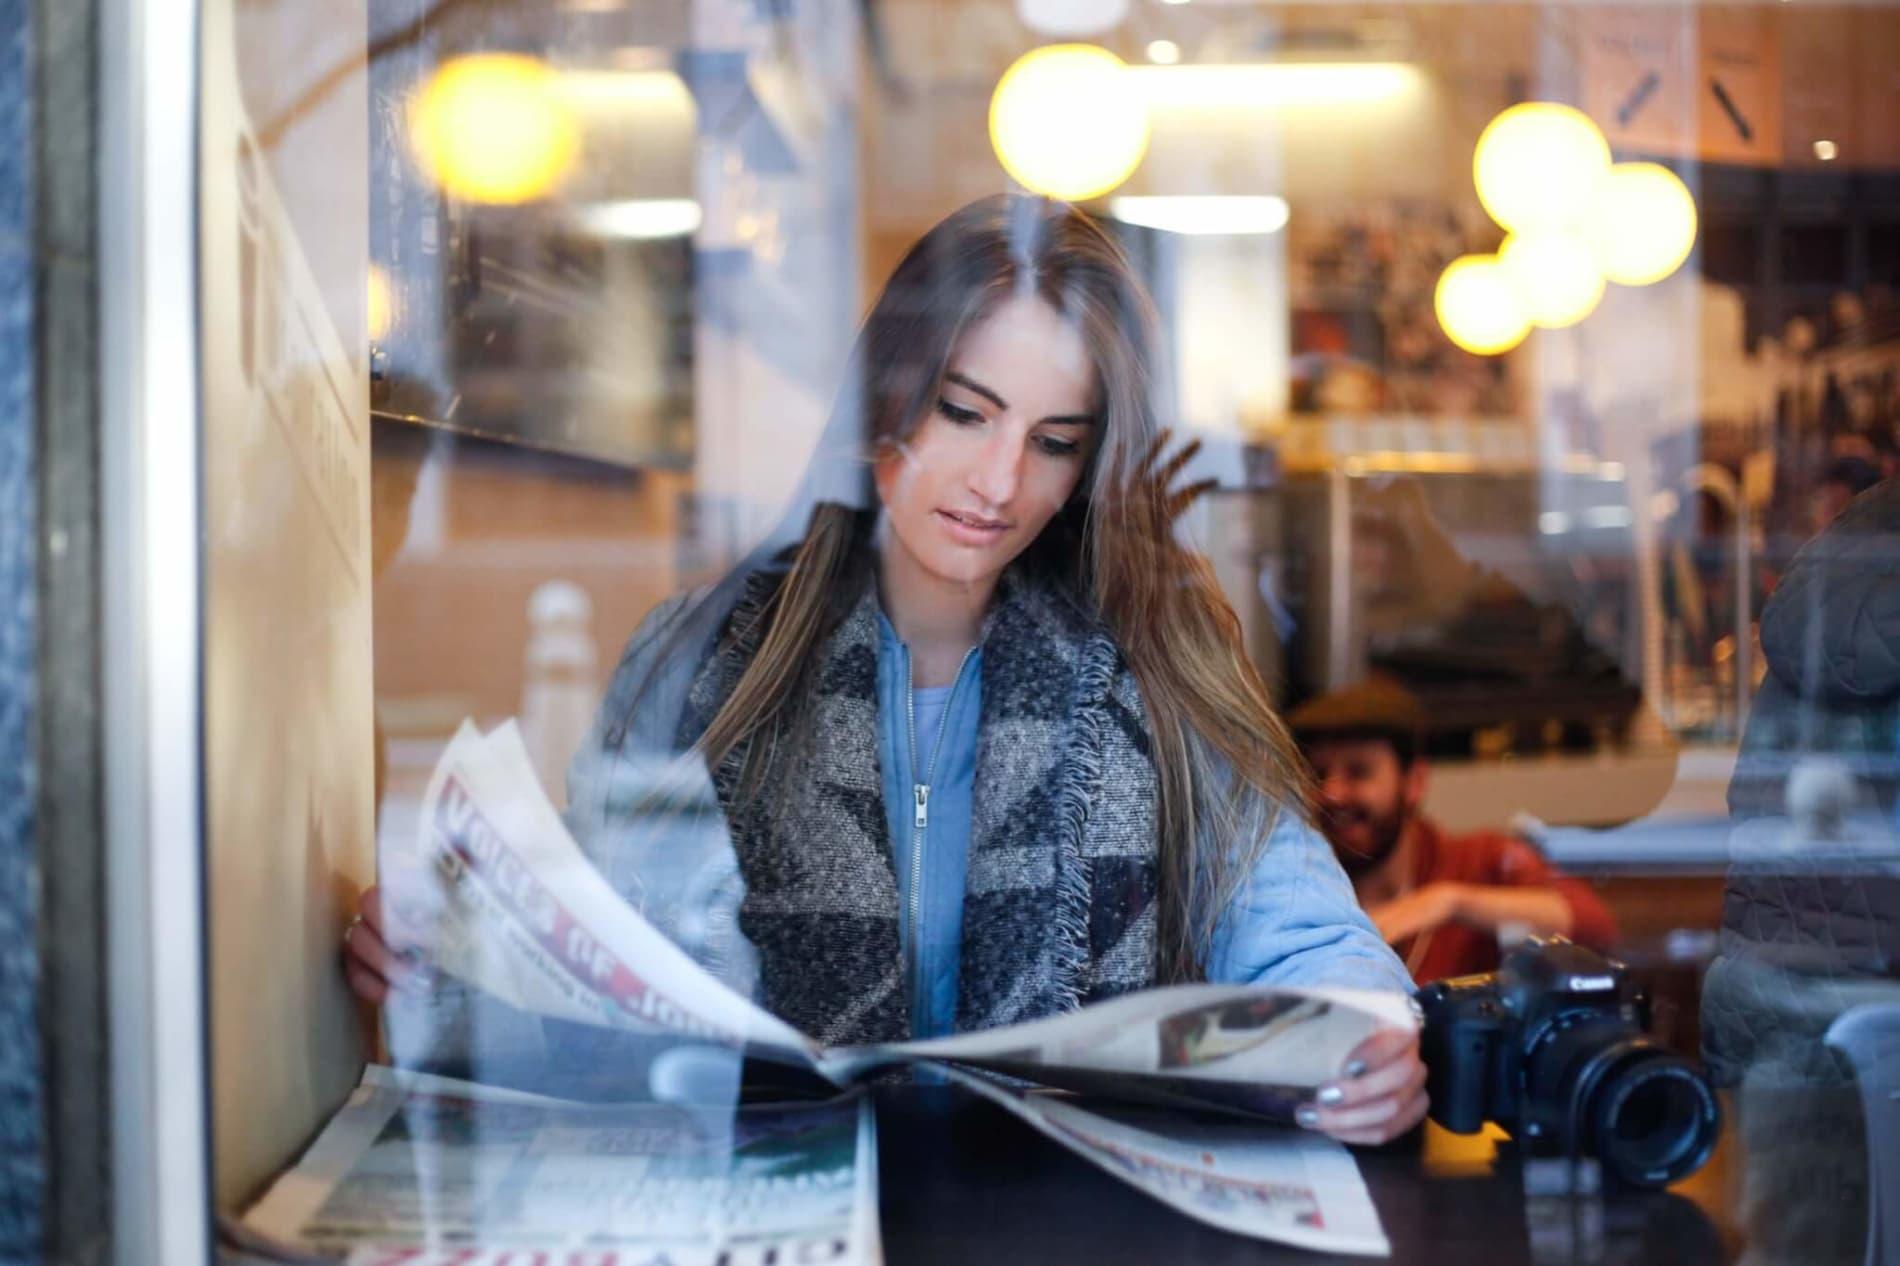 Hibob in the news: December's happy holiday headlines - keenan-constance-F7n6gixbJK0-unsplash.jpg